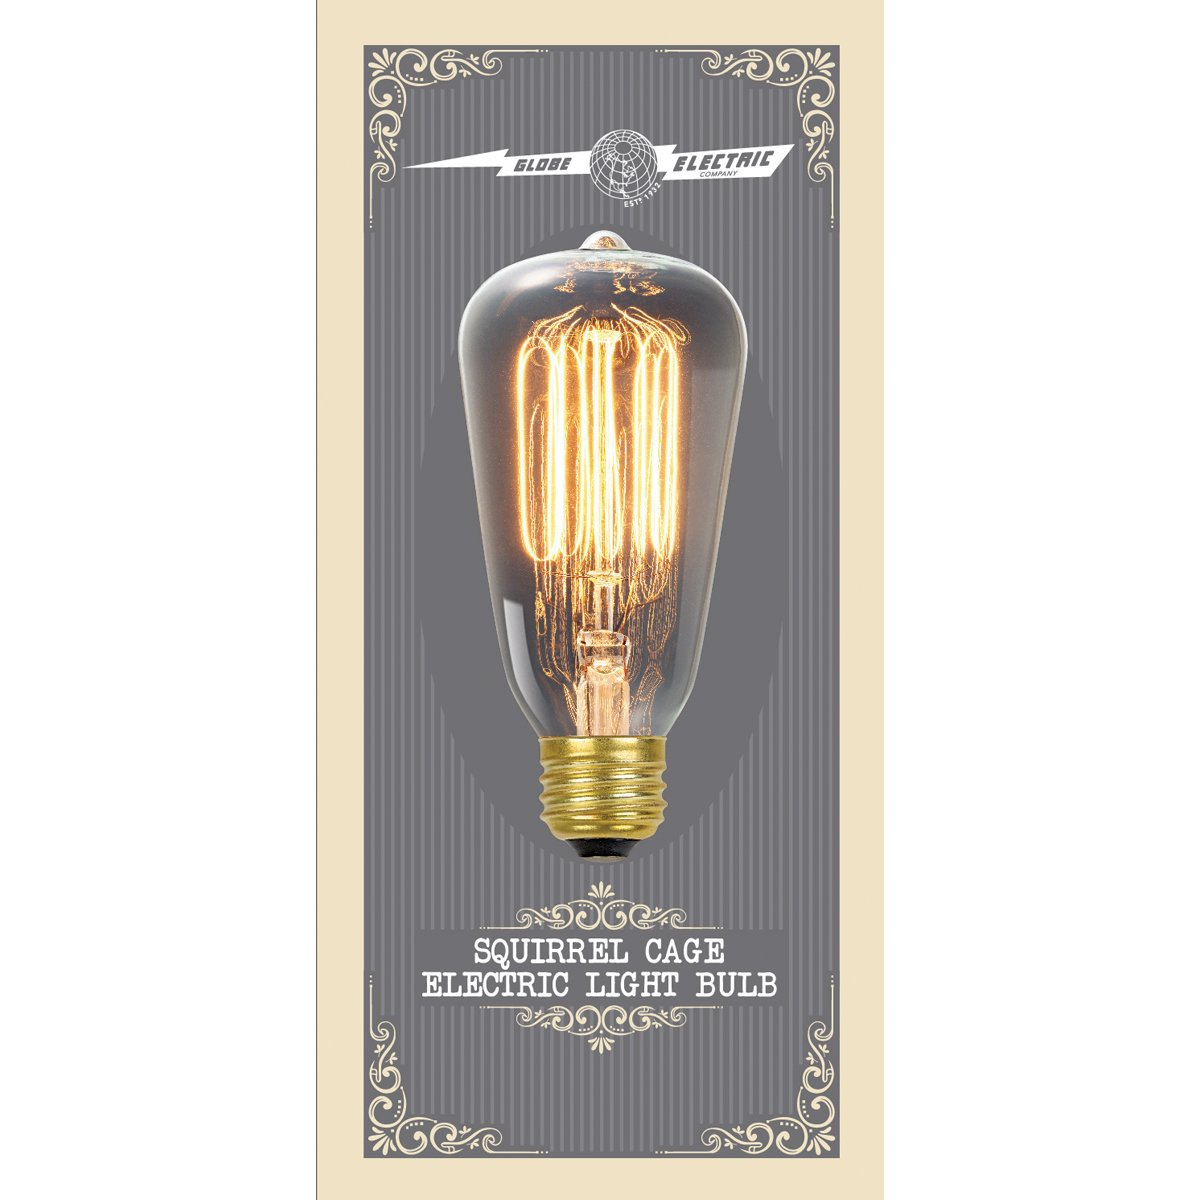 globe electric 60w vintage edison s60 squirrel cage filament light bulb e26 base 245 lumens amazoncom